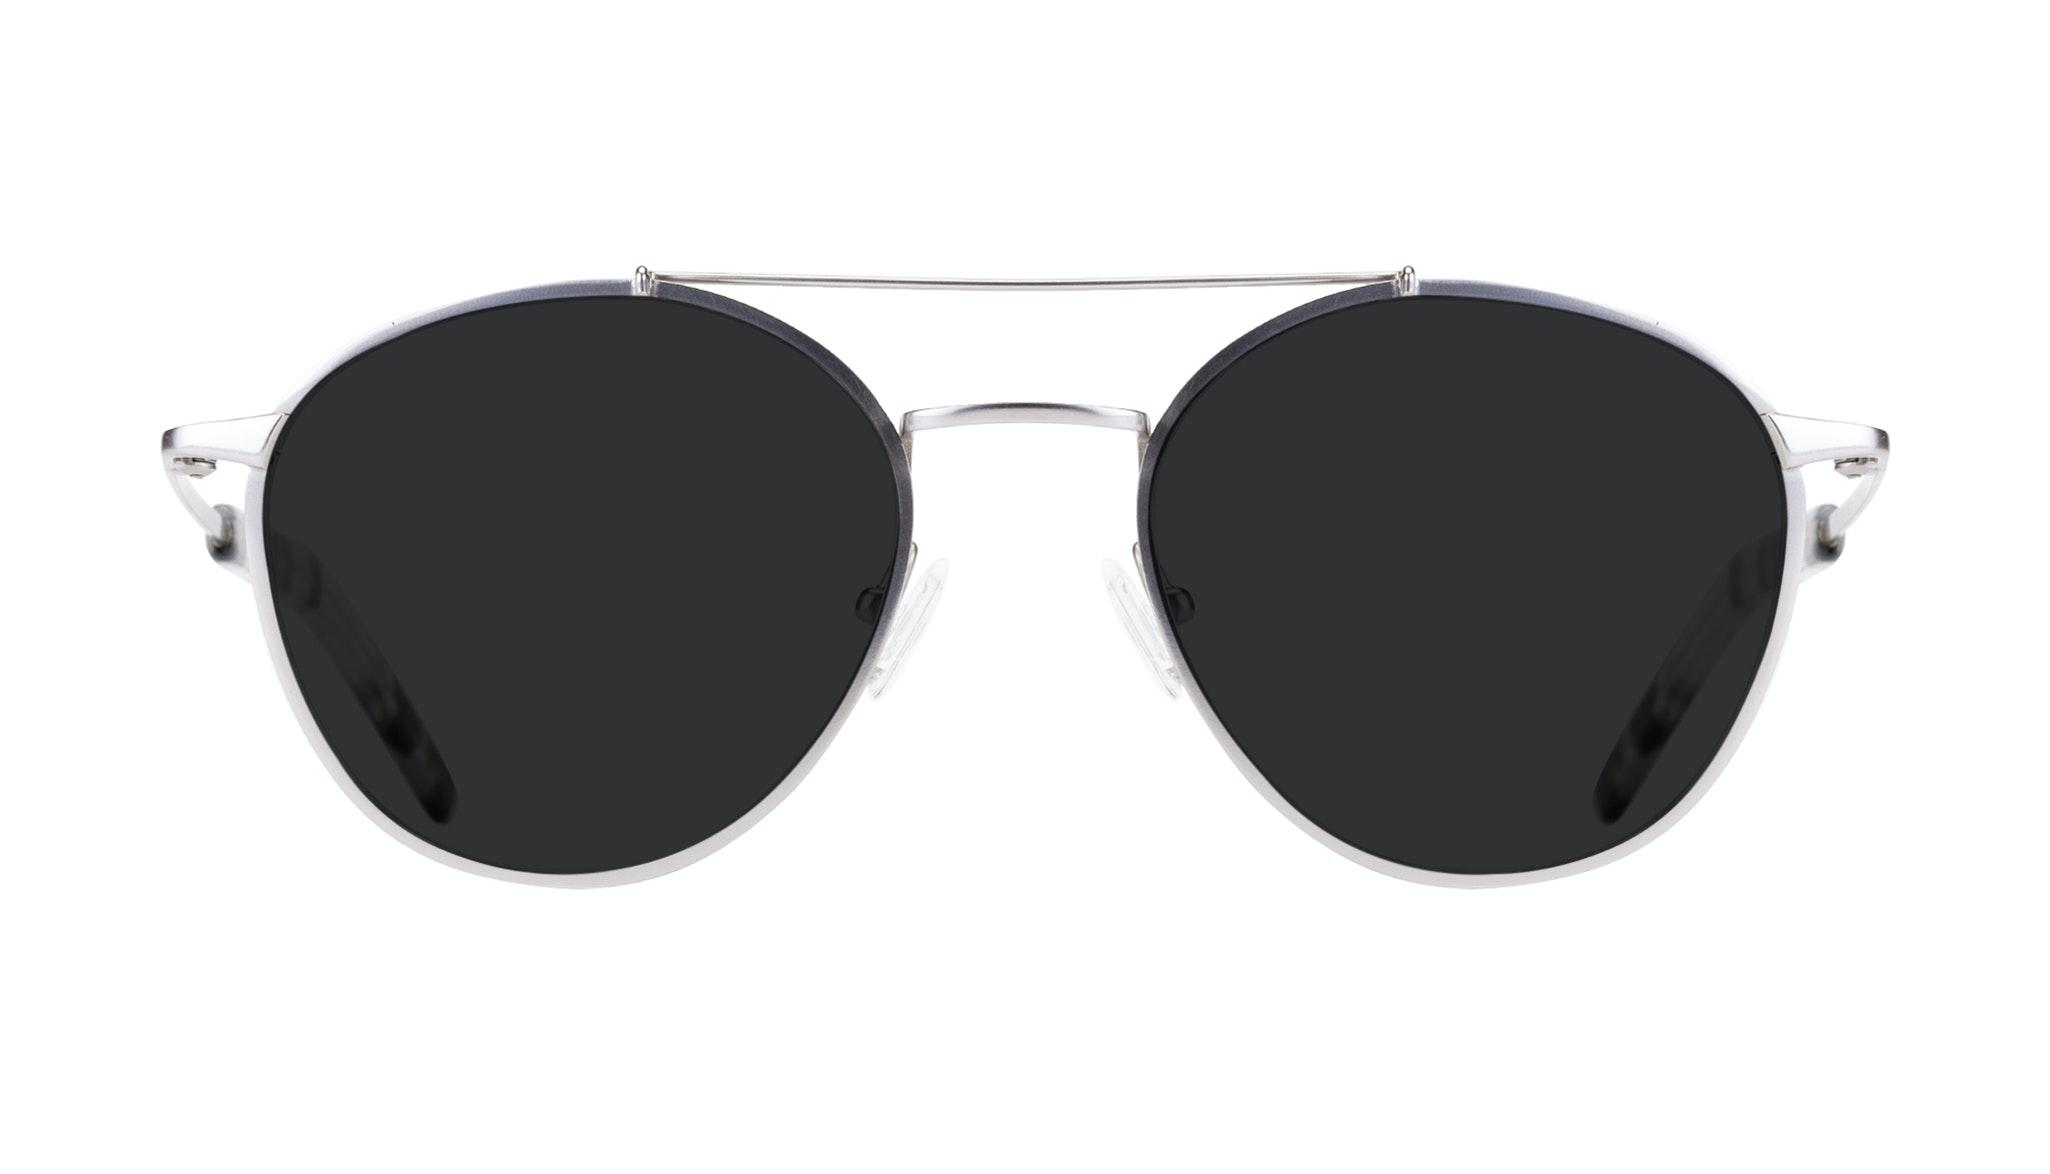 Affordable Fashion Glasses Aviator Sunglasses Men Gravity Silver Front